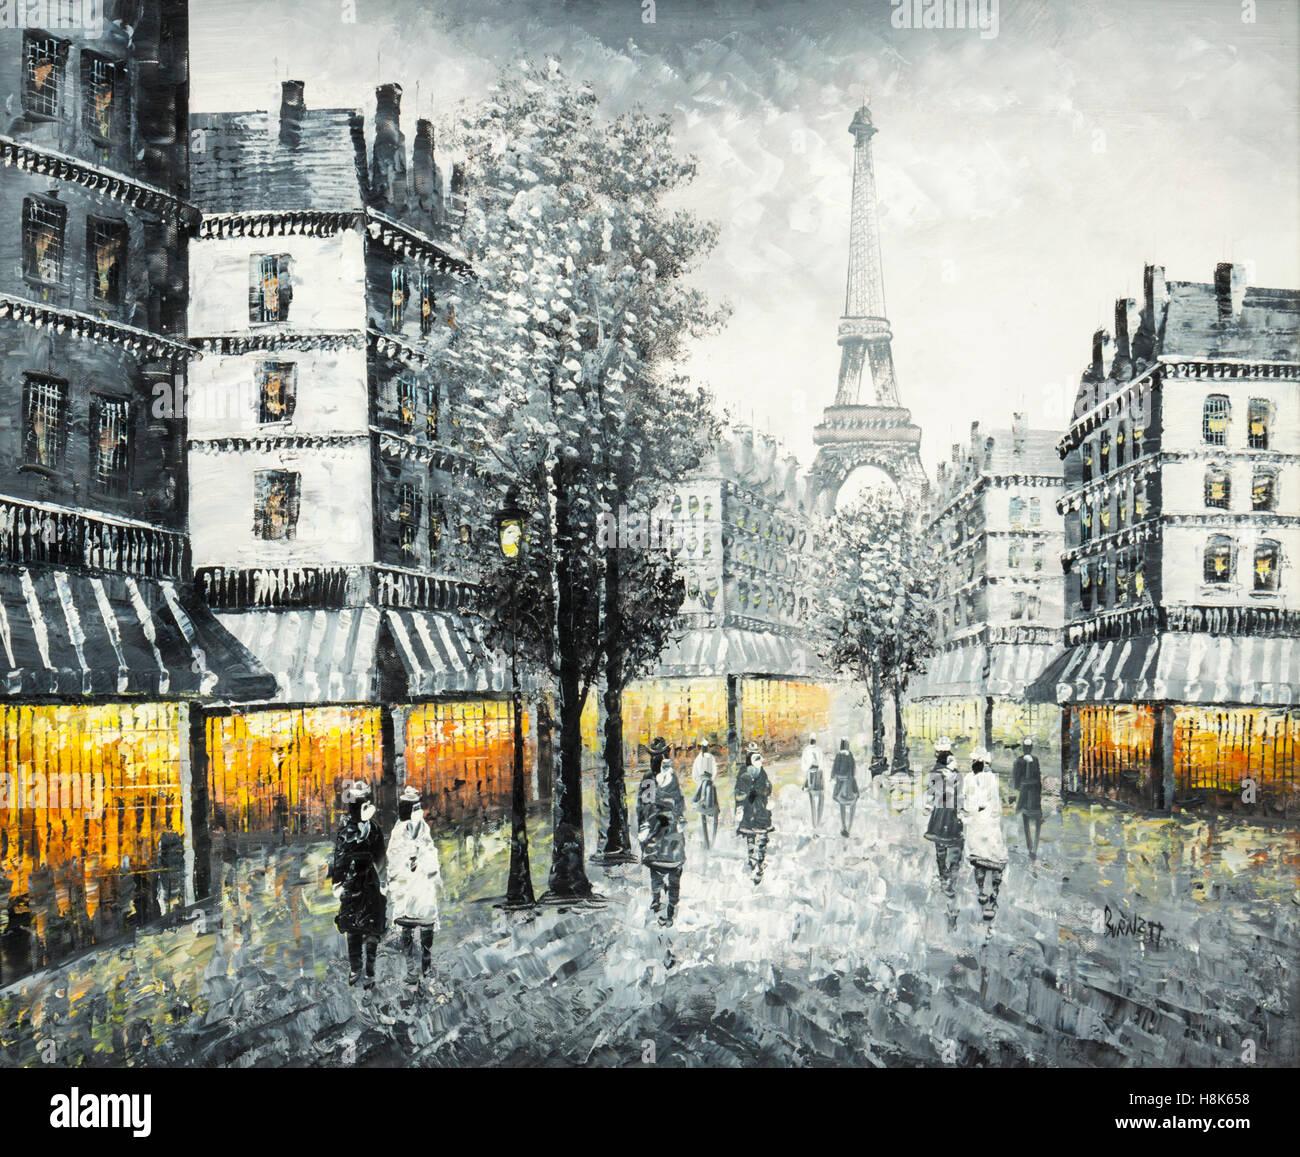 Original oil painting on canvas of a Paris street scene